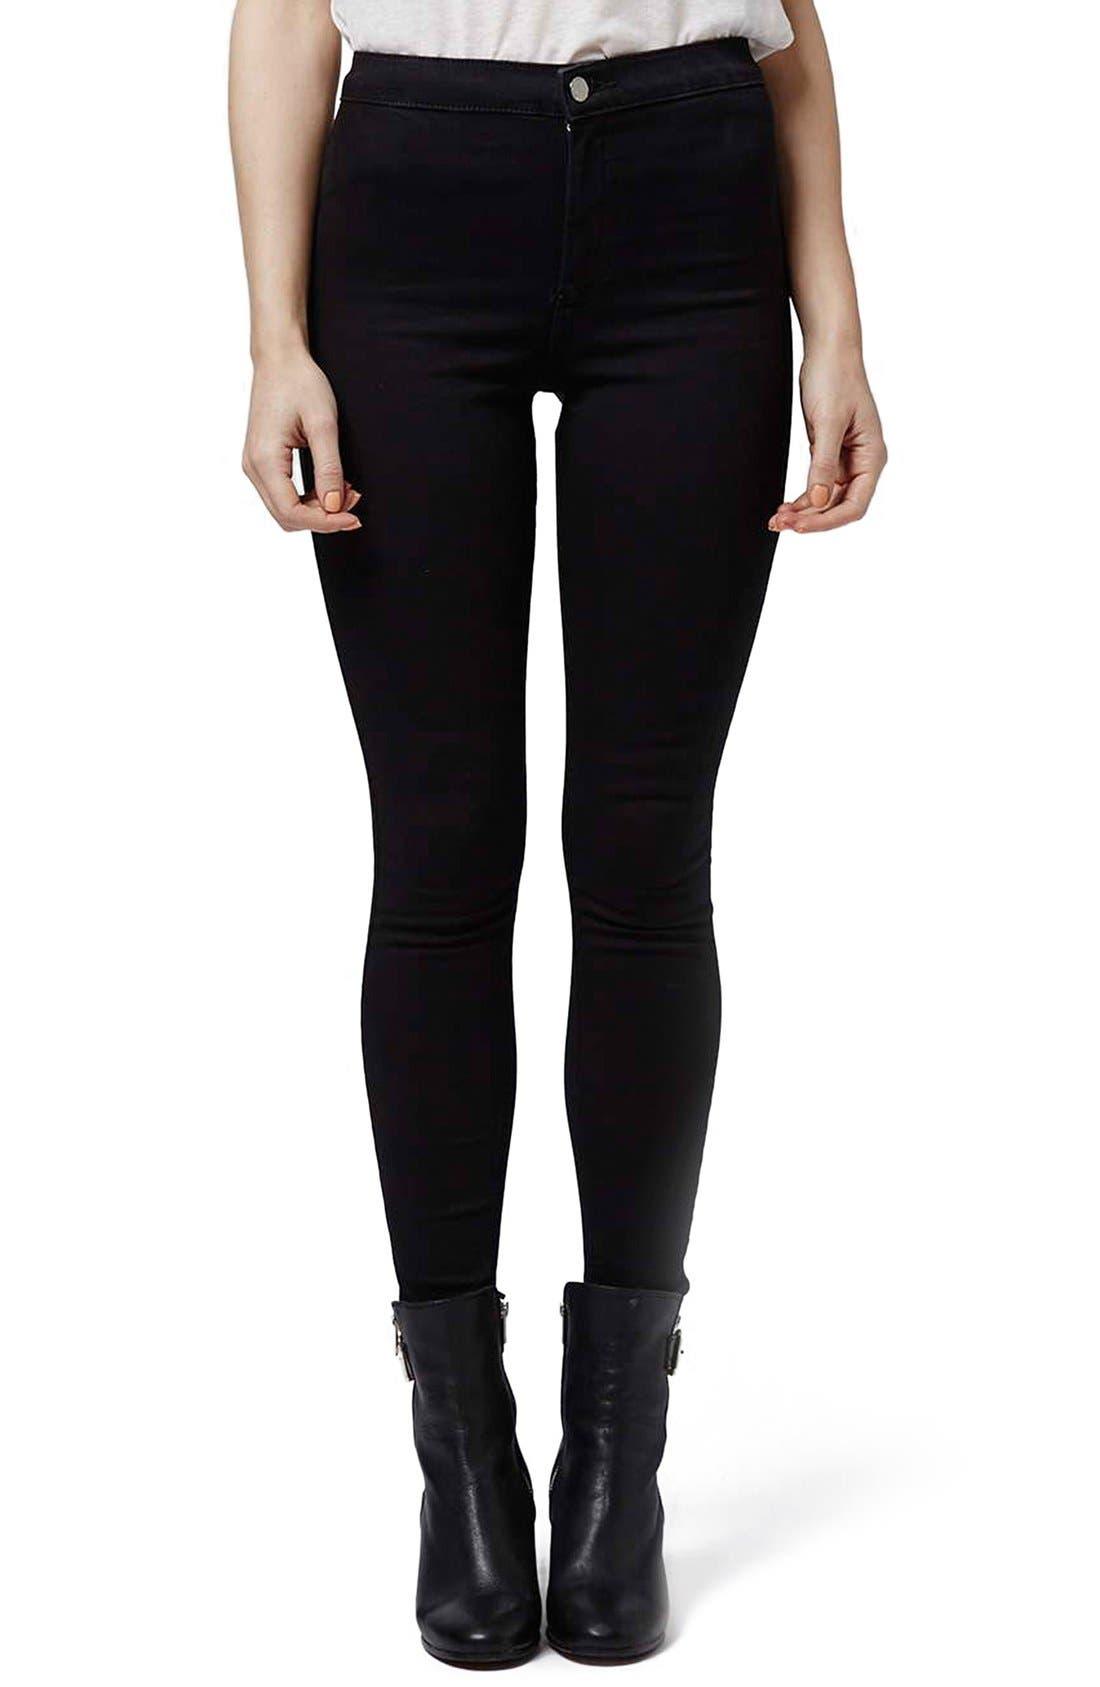 Main Image - Topshop 'Joni' High Rise Skinny Jeans (Petite)